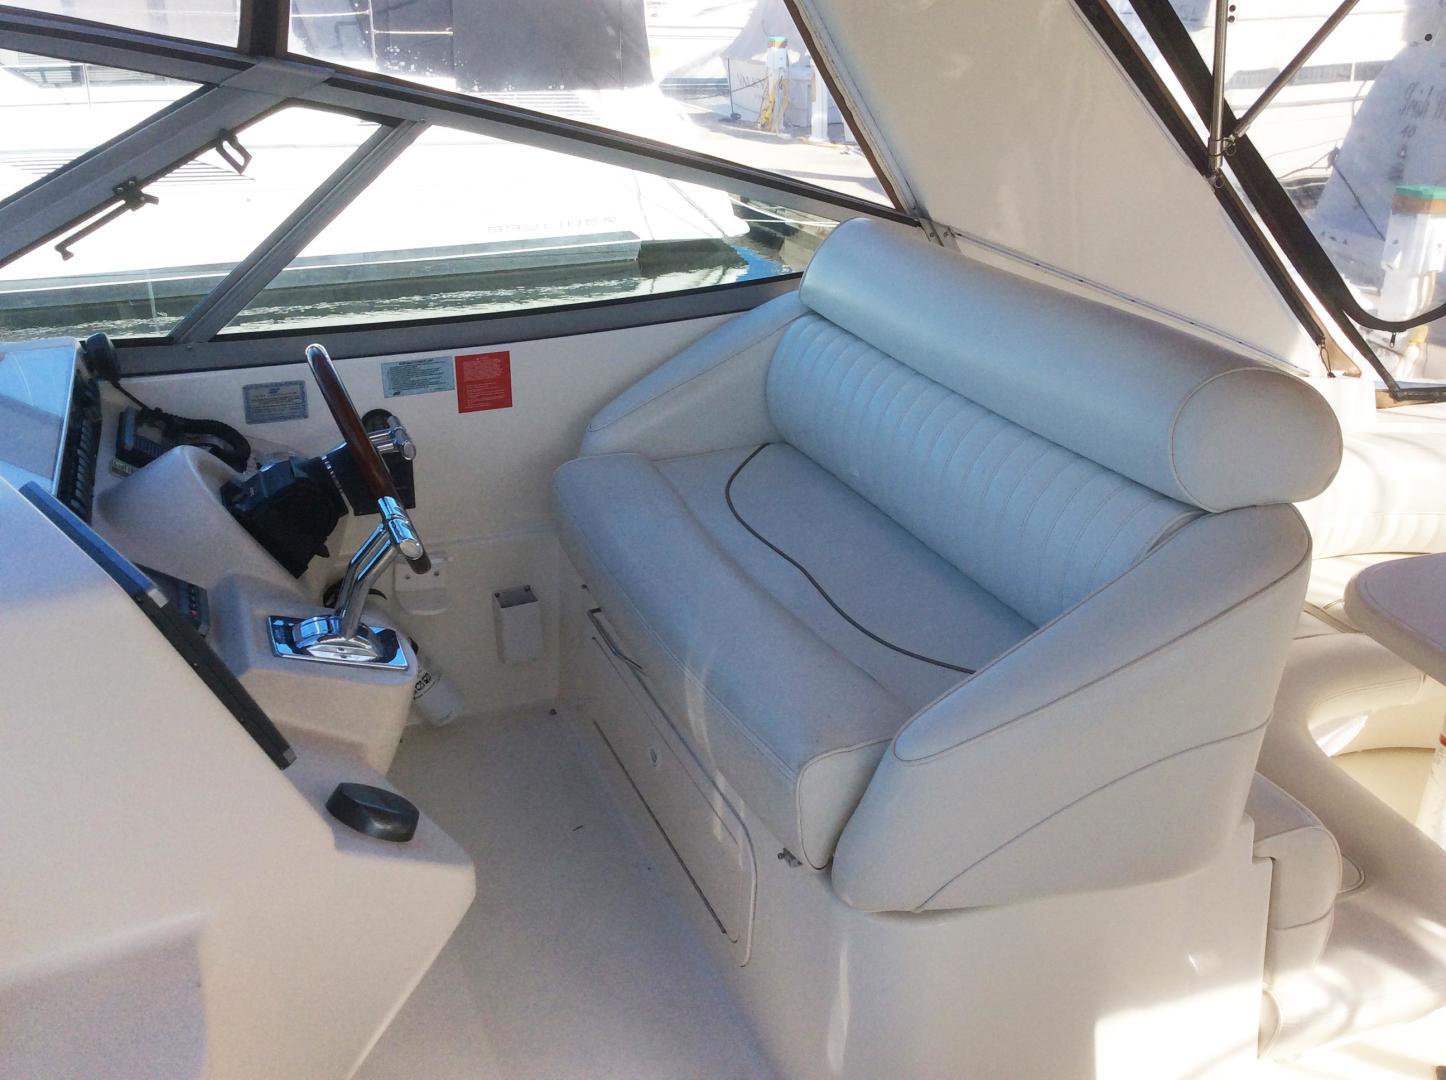 Cruisers-3870 Express 2000-CDreams Destin-Florida-United States-2000 38 Cruisers CDreams Helm-716043 | Thumbnail